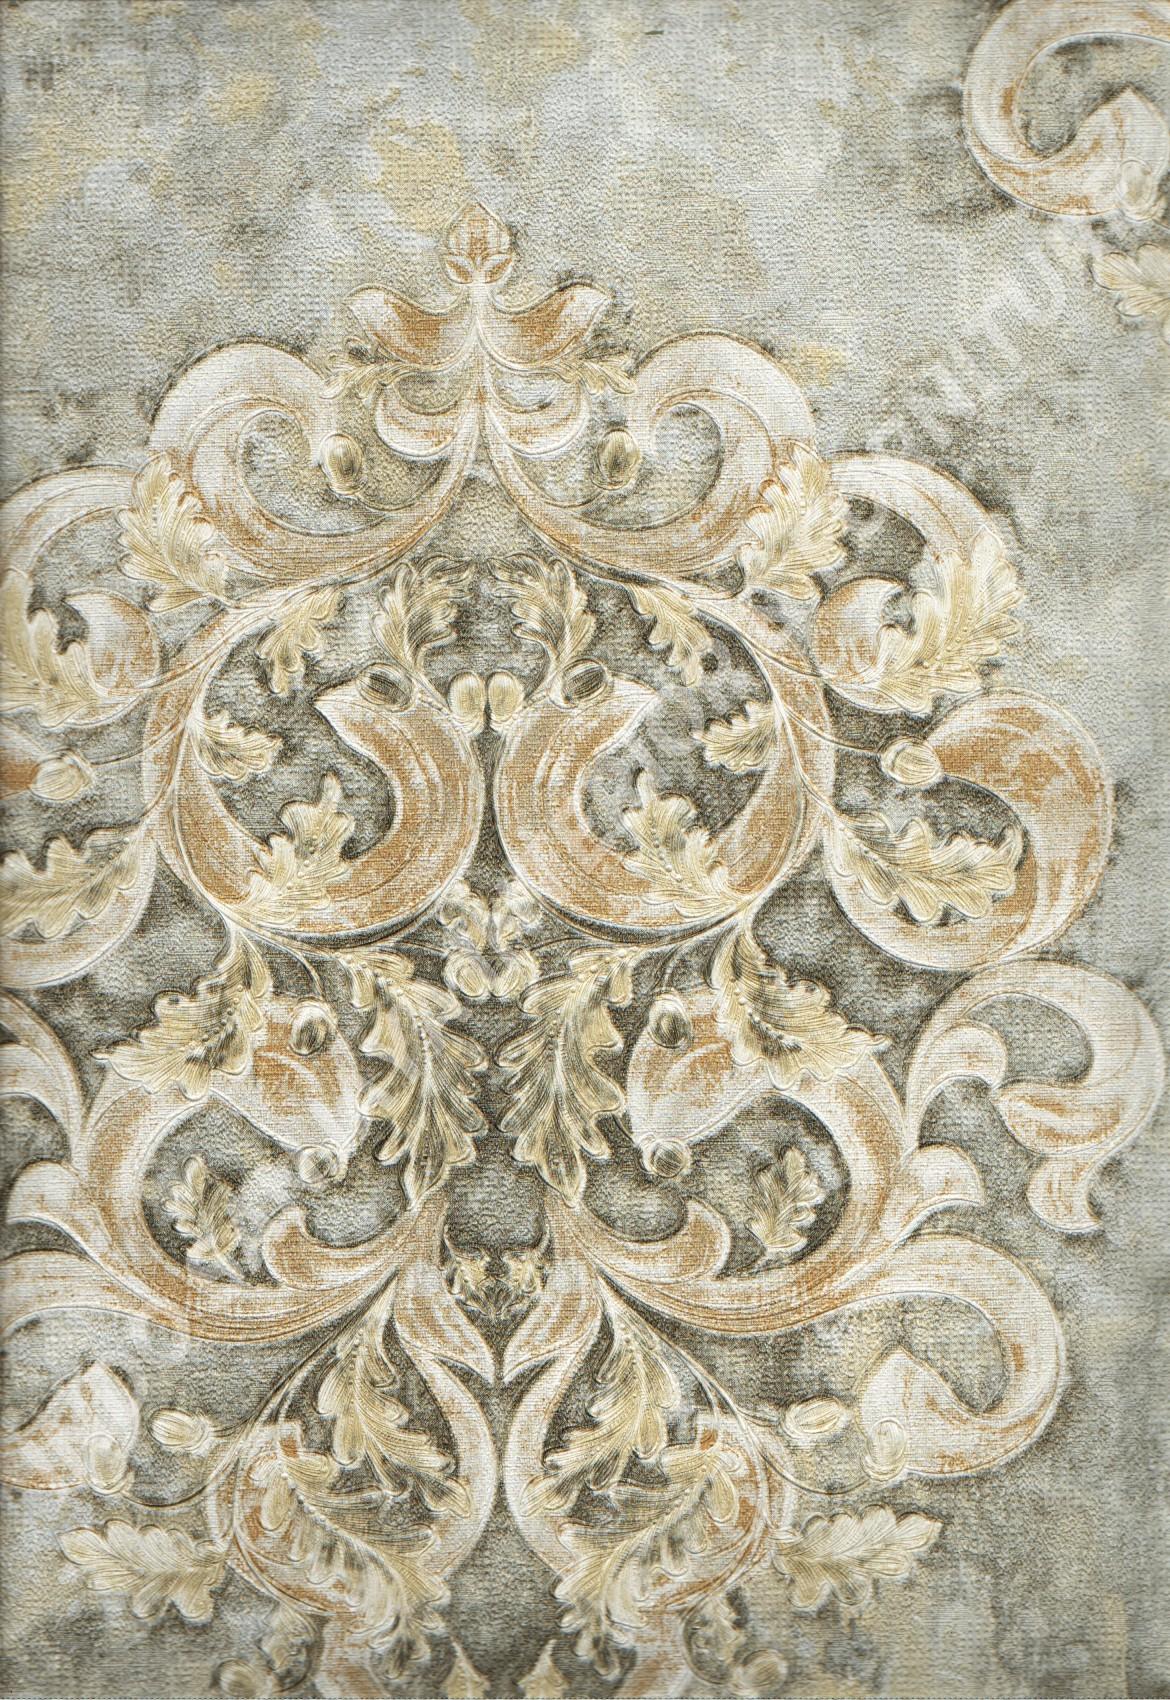 wallpaper   Wallpaper Klasik Batik (Damask) DL10303:DL10303 corak  warna